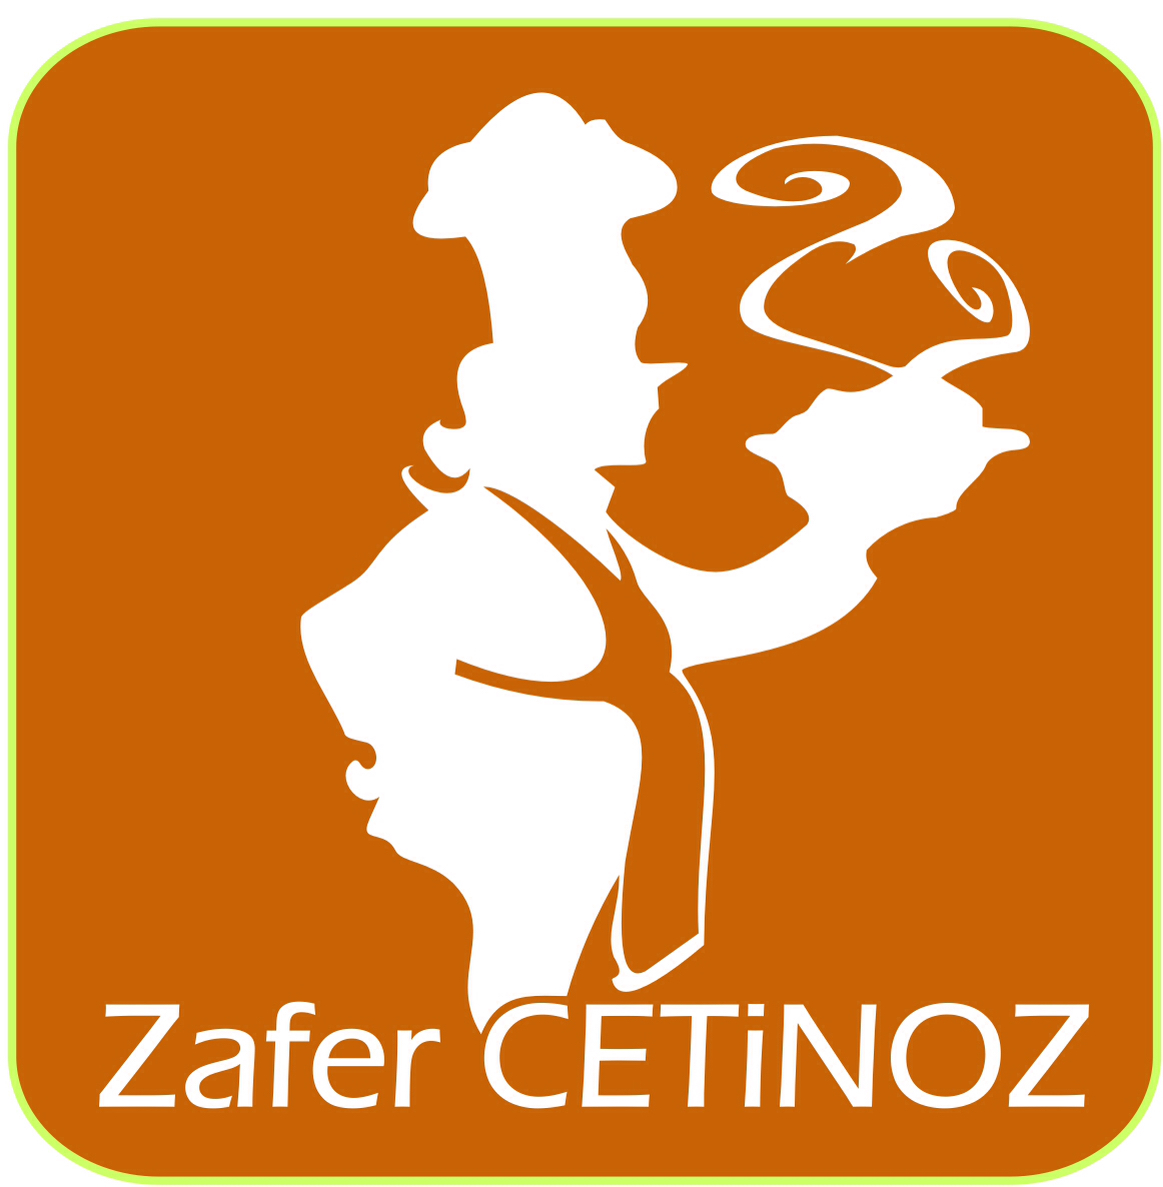 Rixos Quba azerbaijan Open Buffet Dinner Zafer Çetinöz.